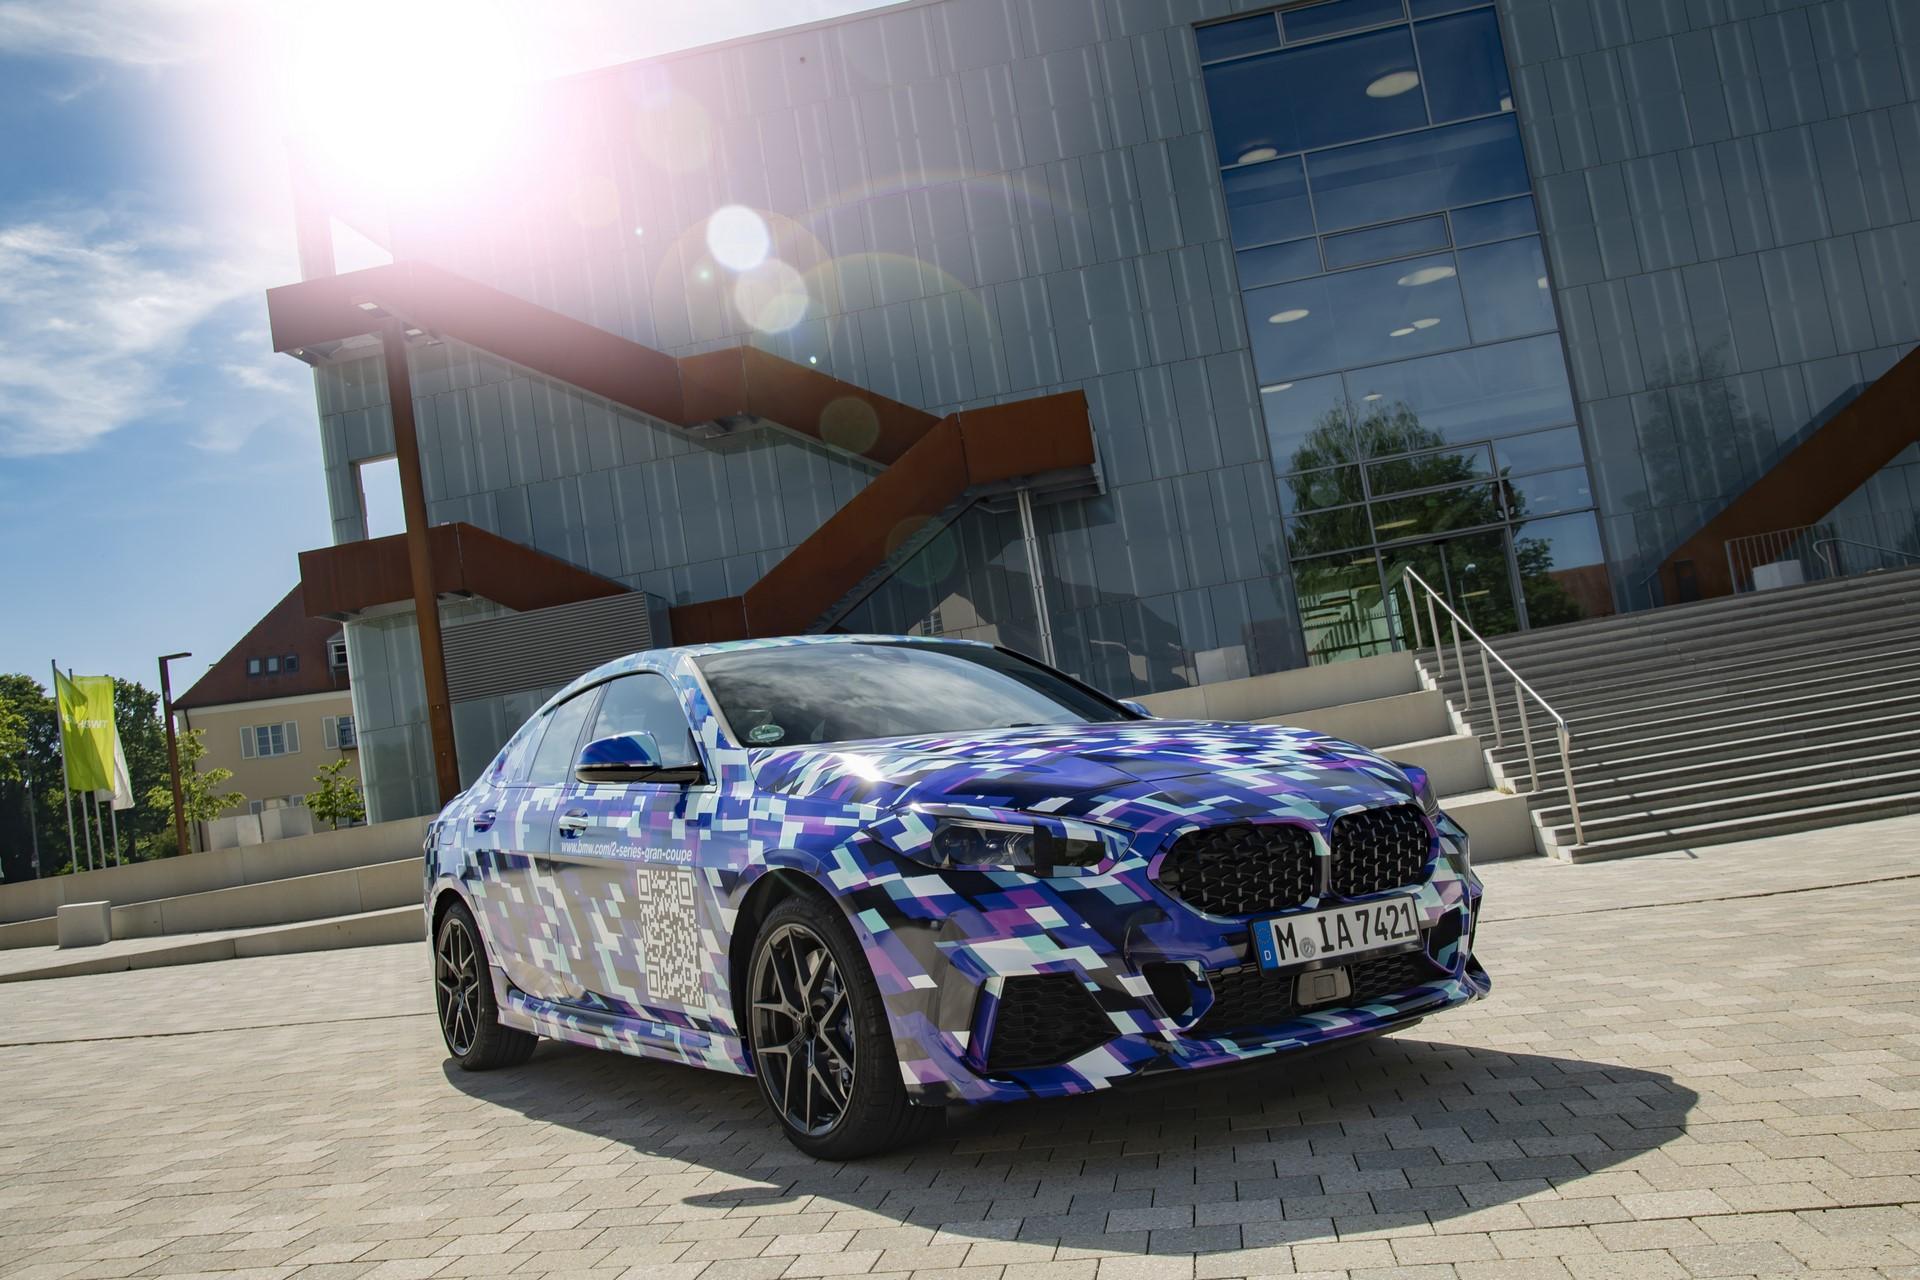 BMW-2-Series-Gran-Coupe-2020-spy-photos-25